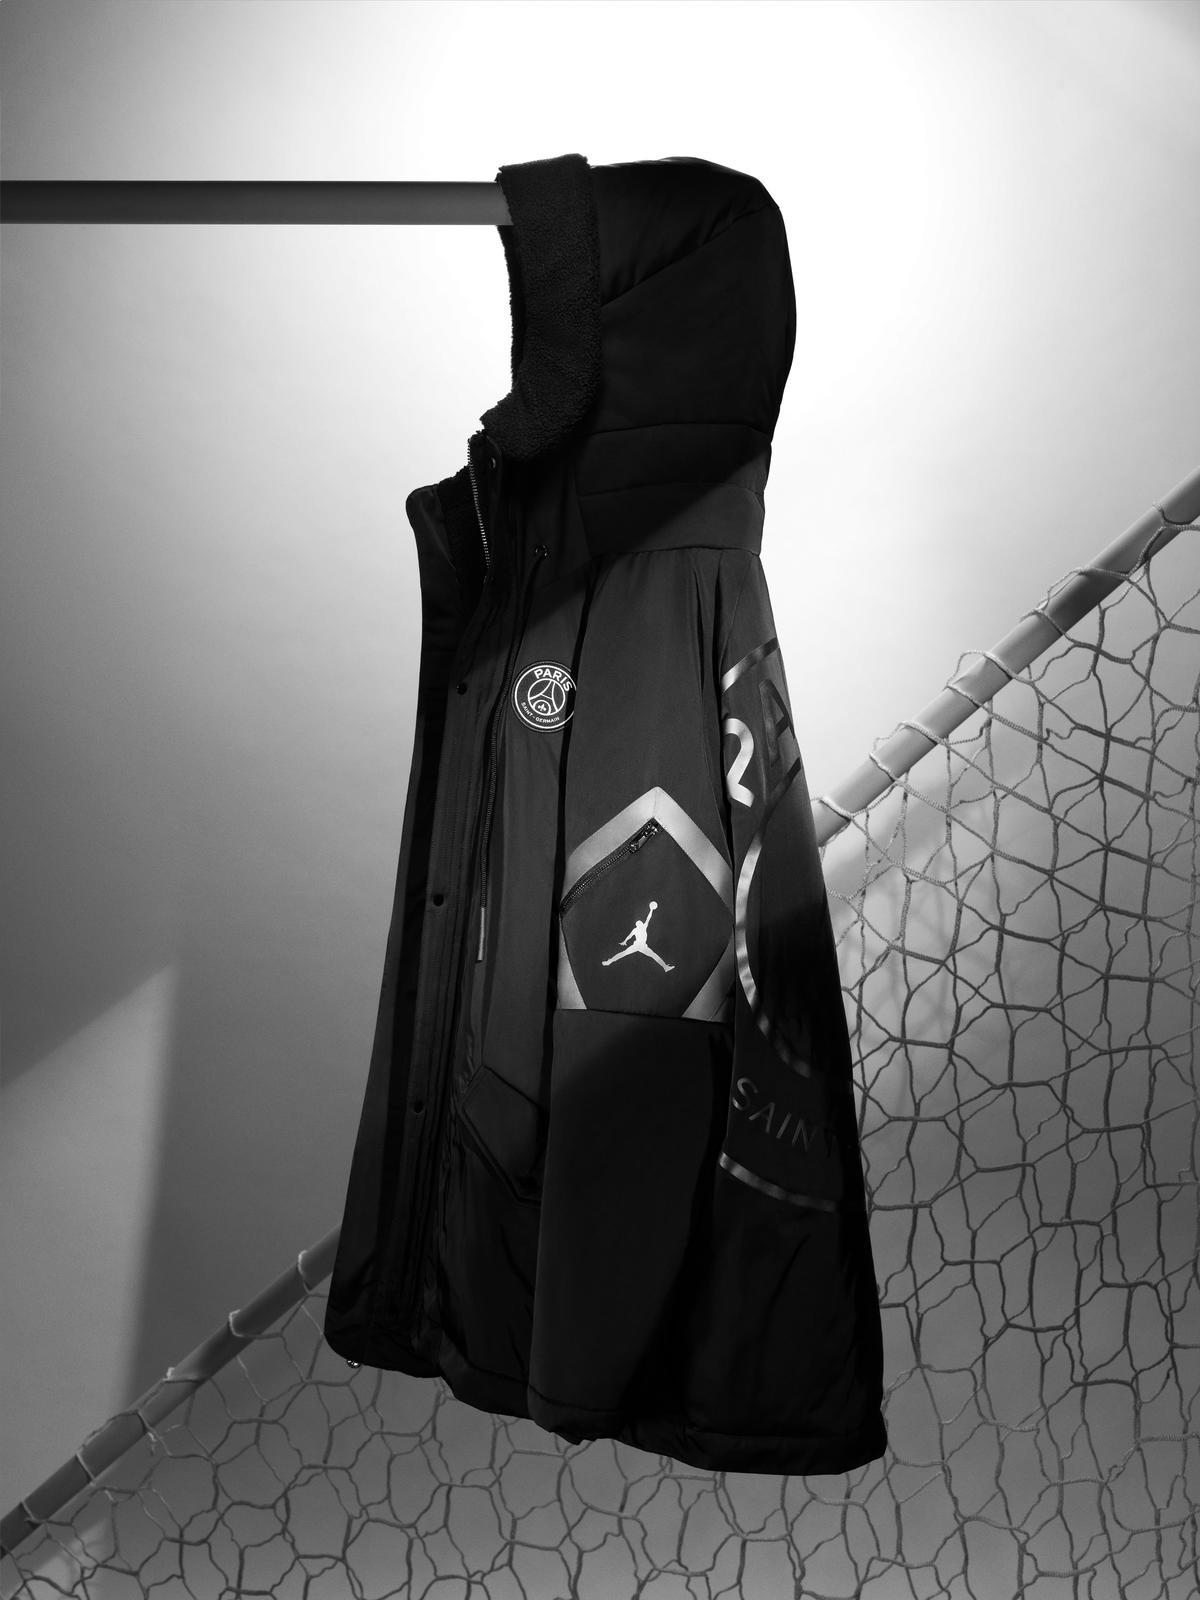 Jordan_Brand__Paris_Saint-Germain_as_its_First-Ever_Football_Club_Soccer_13_81726